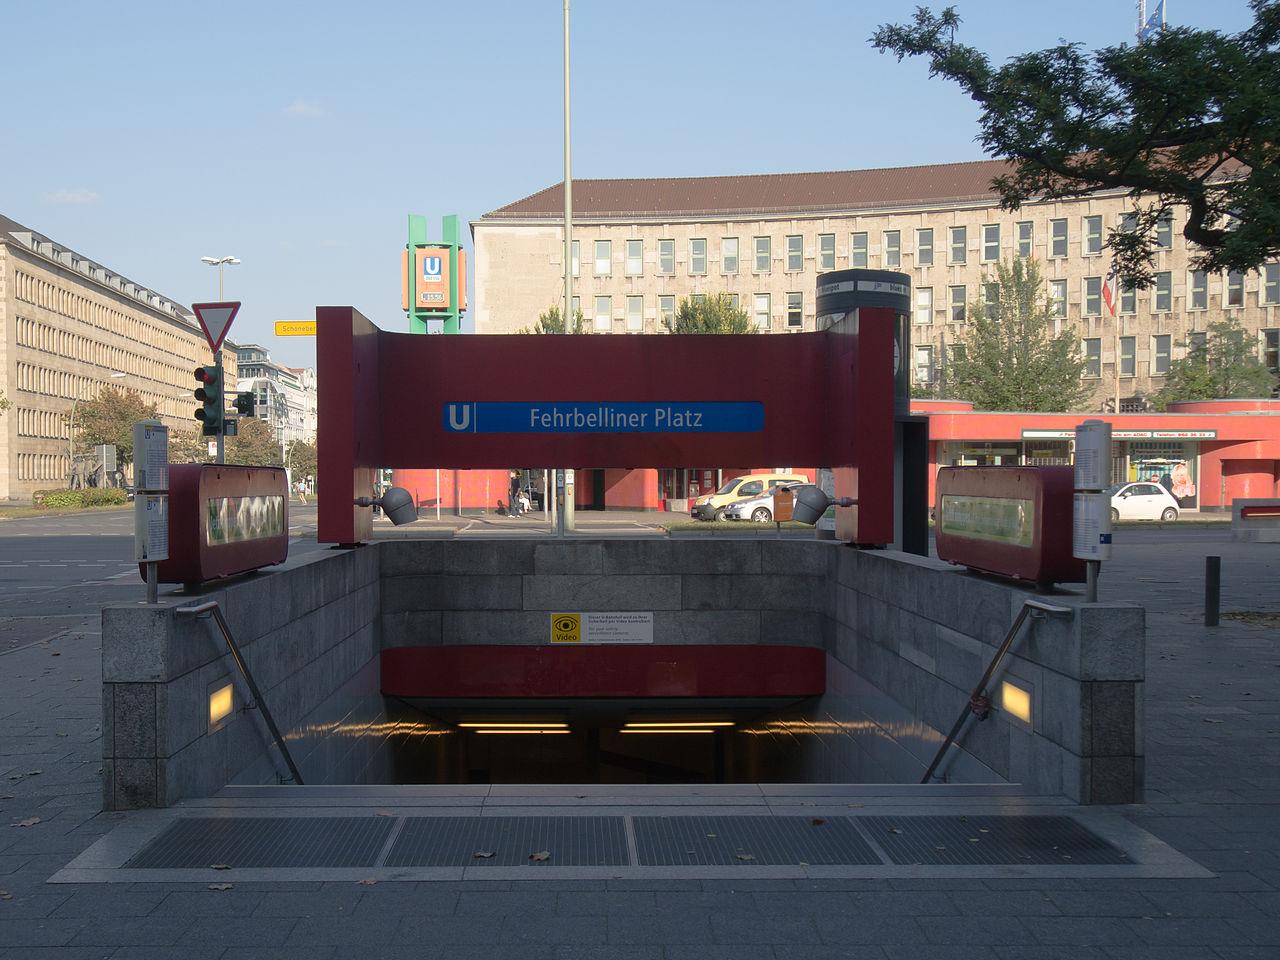 U-Bahnhof Fehrbelliner Platz 20141003 14.jpg